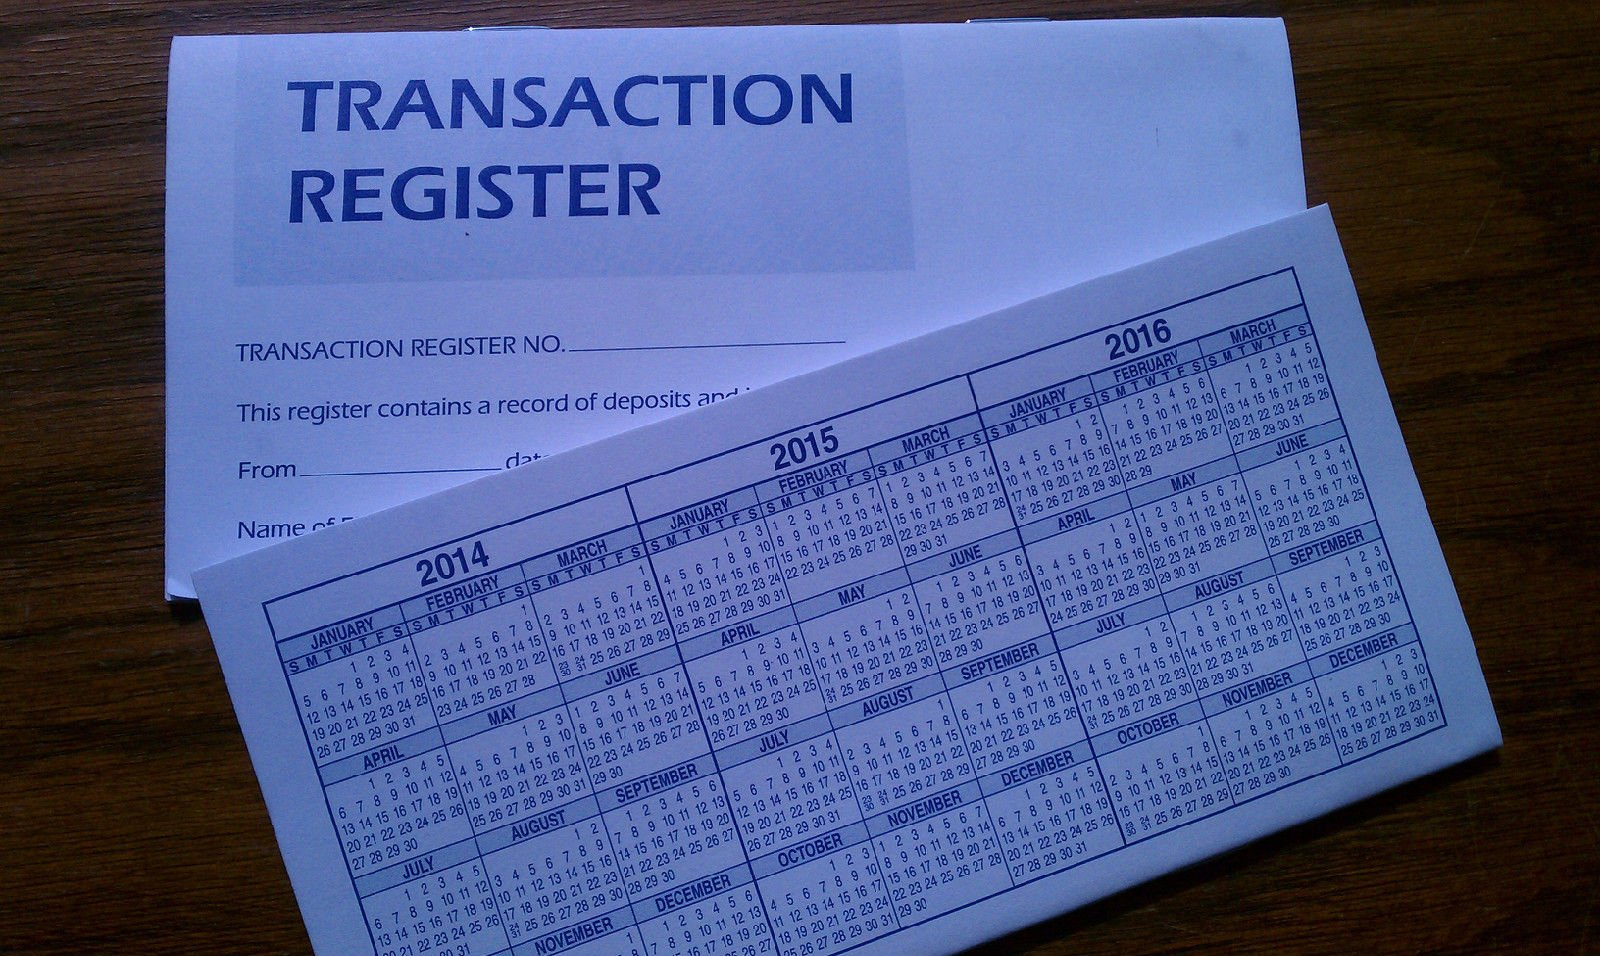 5 Checkbook Transaction Registers 2014-2015-2016 Calendars